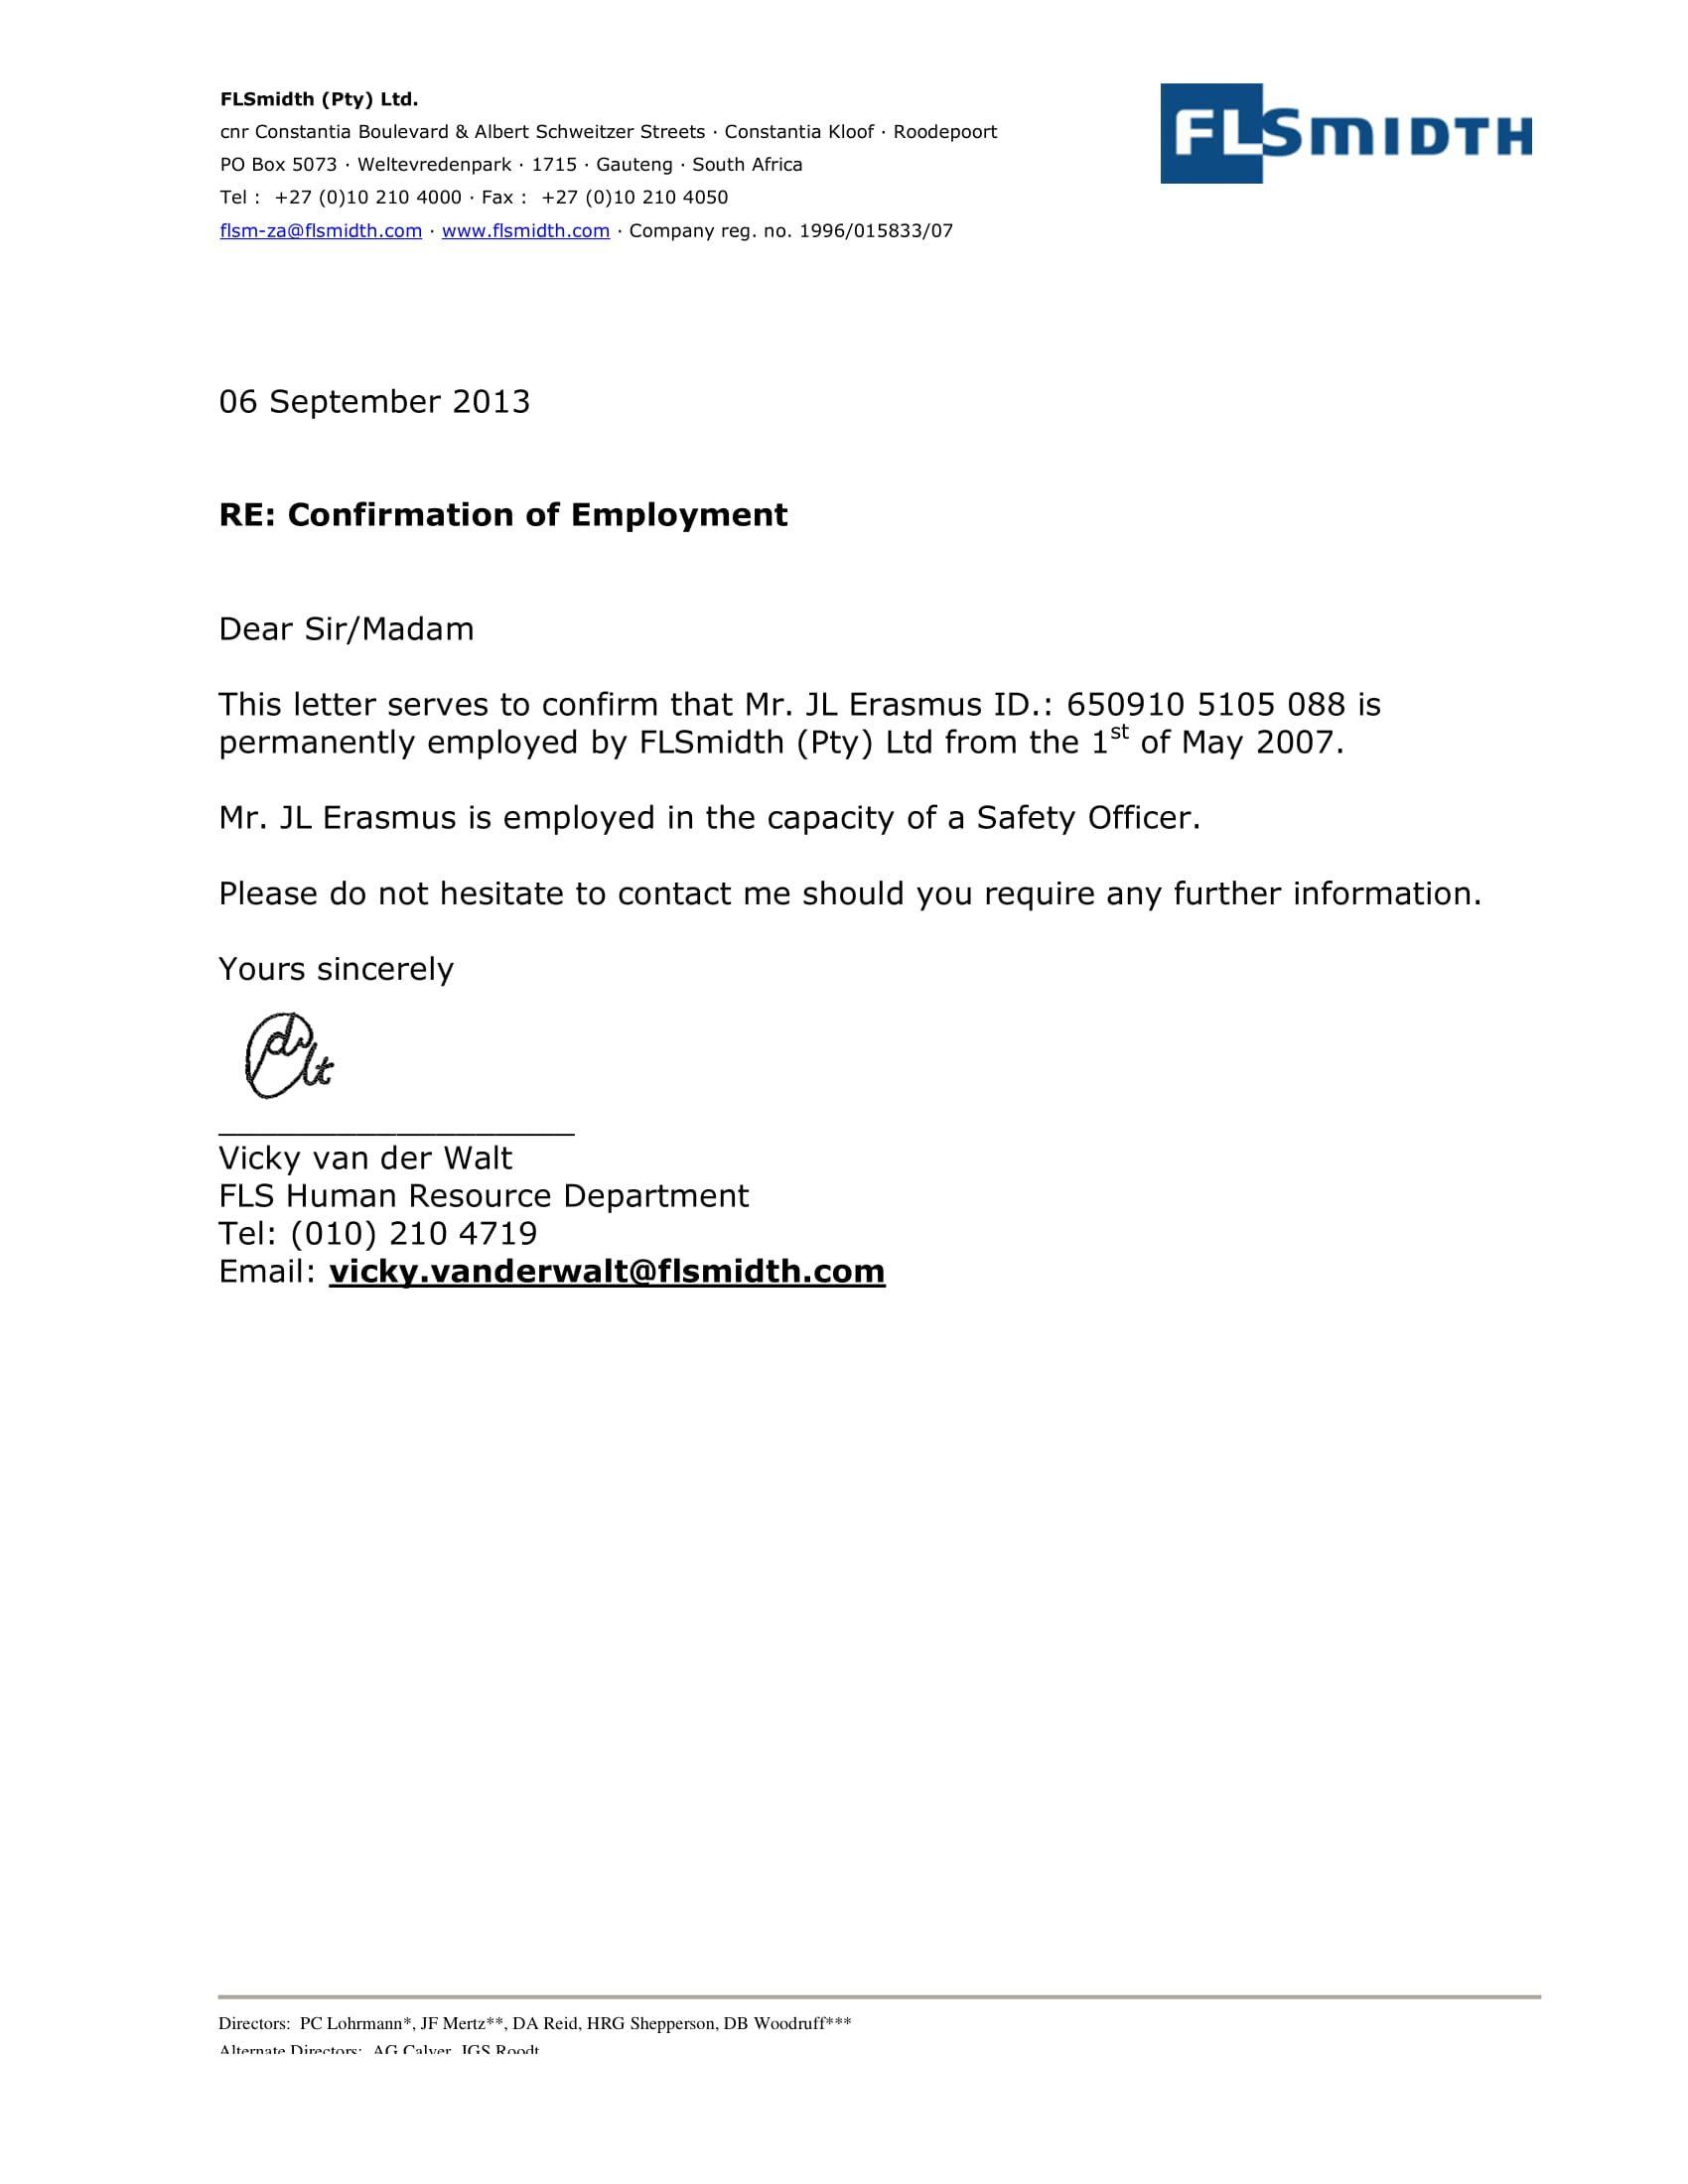 Fresh Employment Verification Letter For You,https